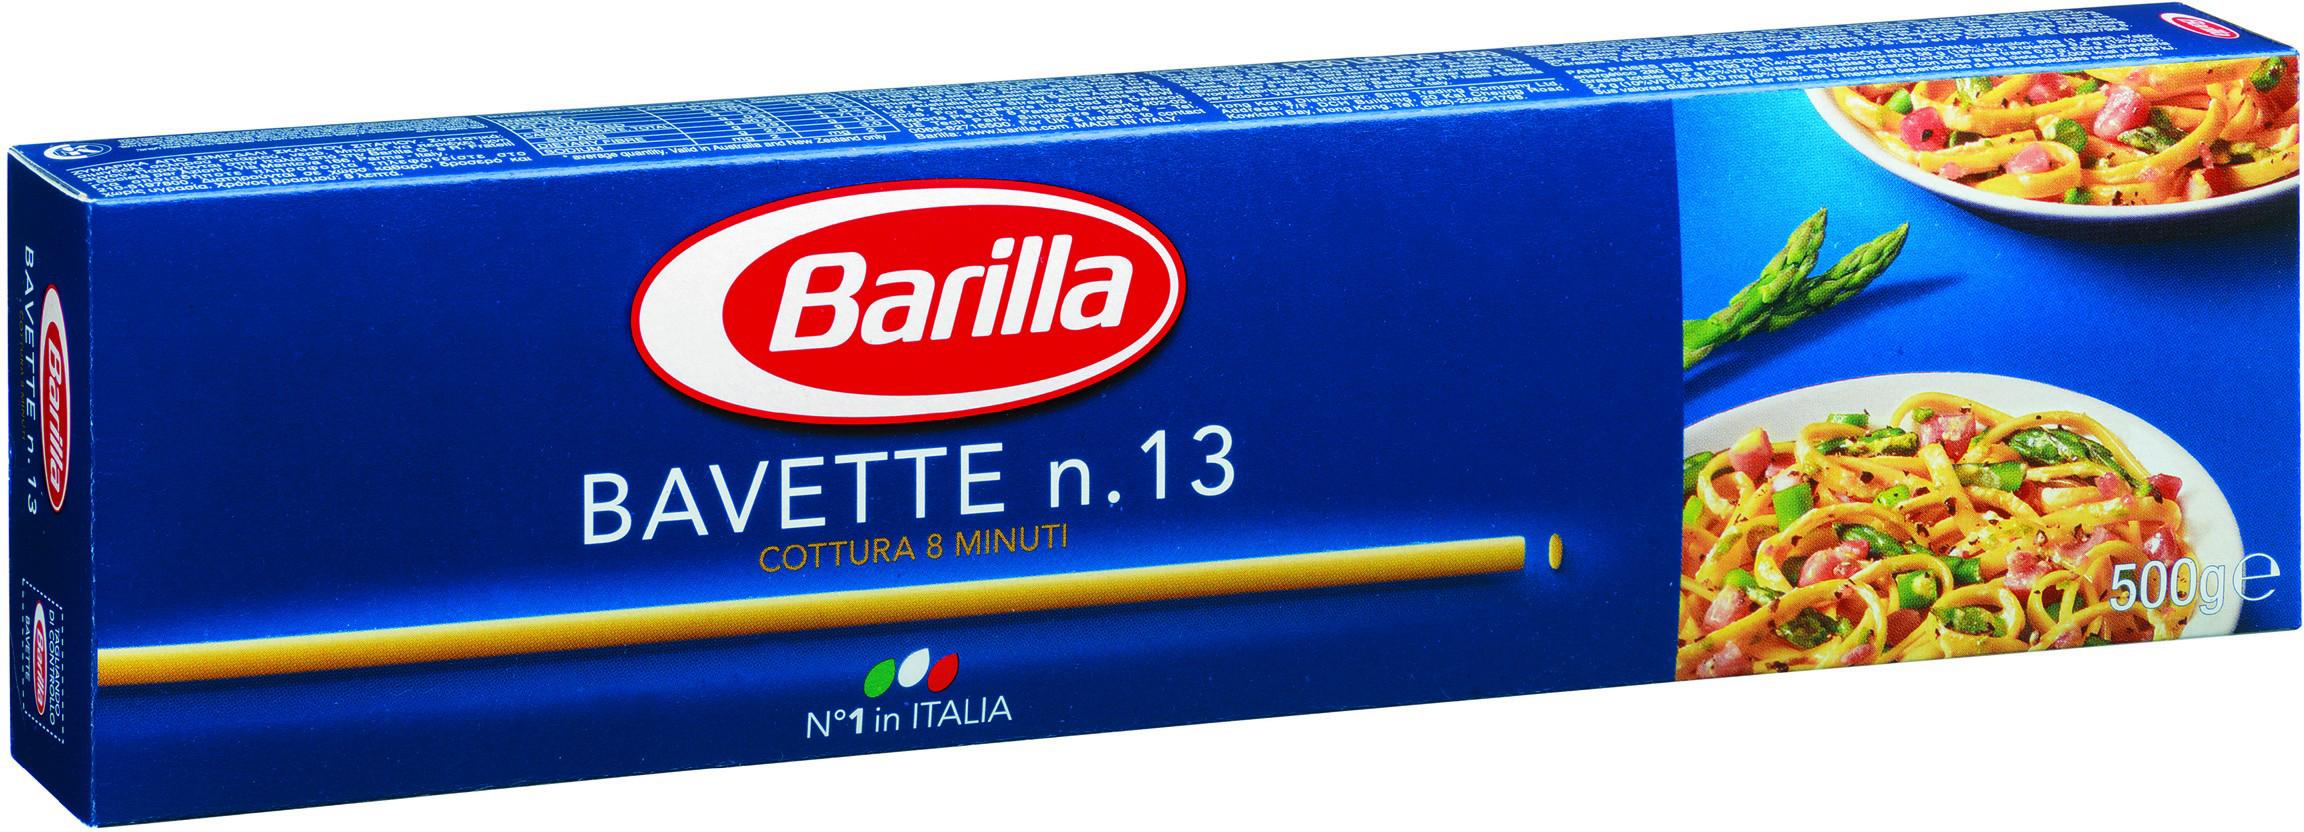 Barilla Bavette n13, makaron krajanka 500 g Image